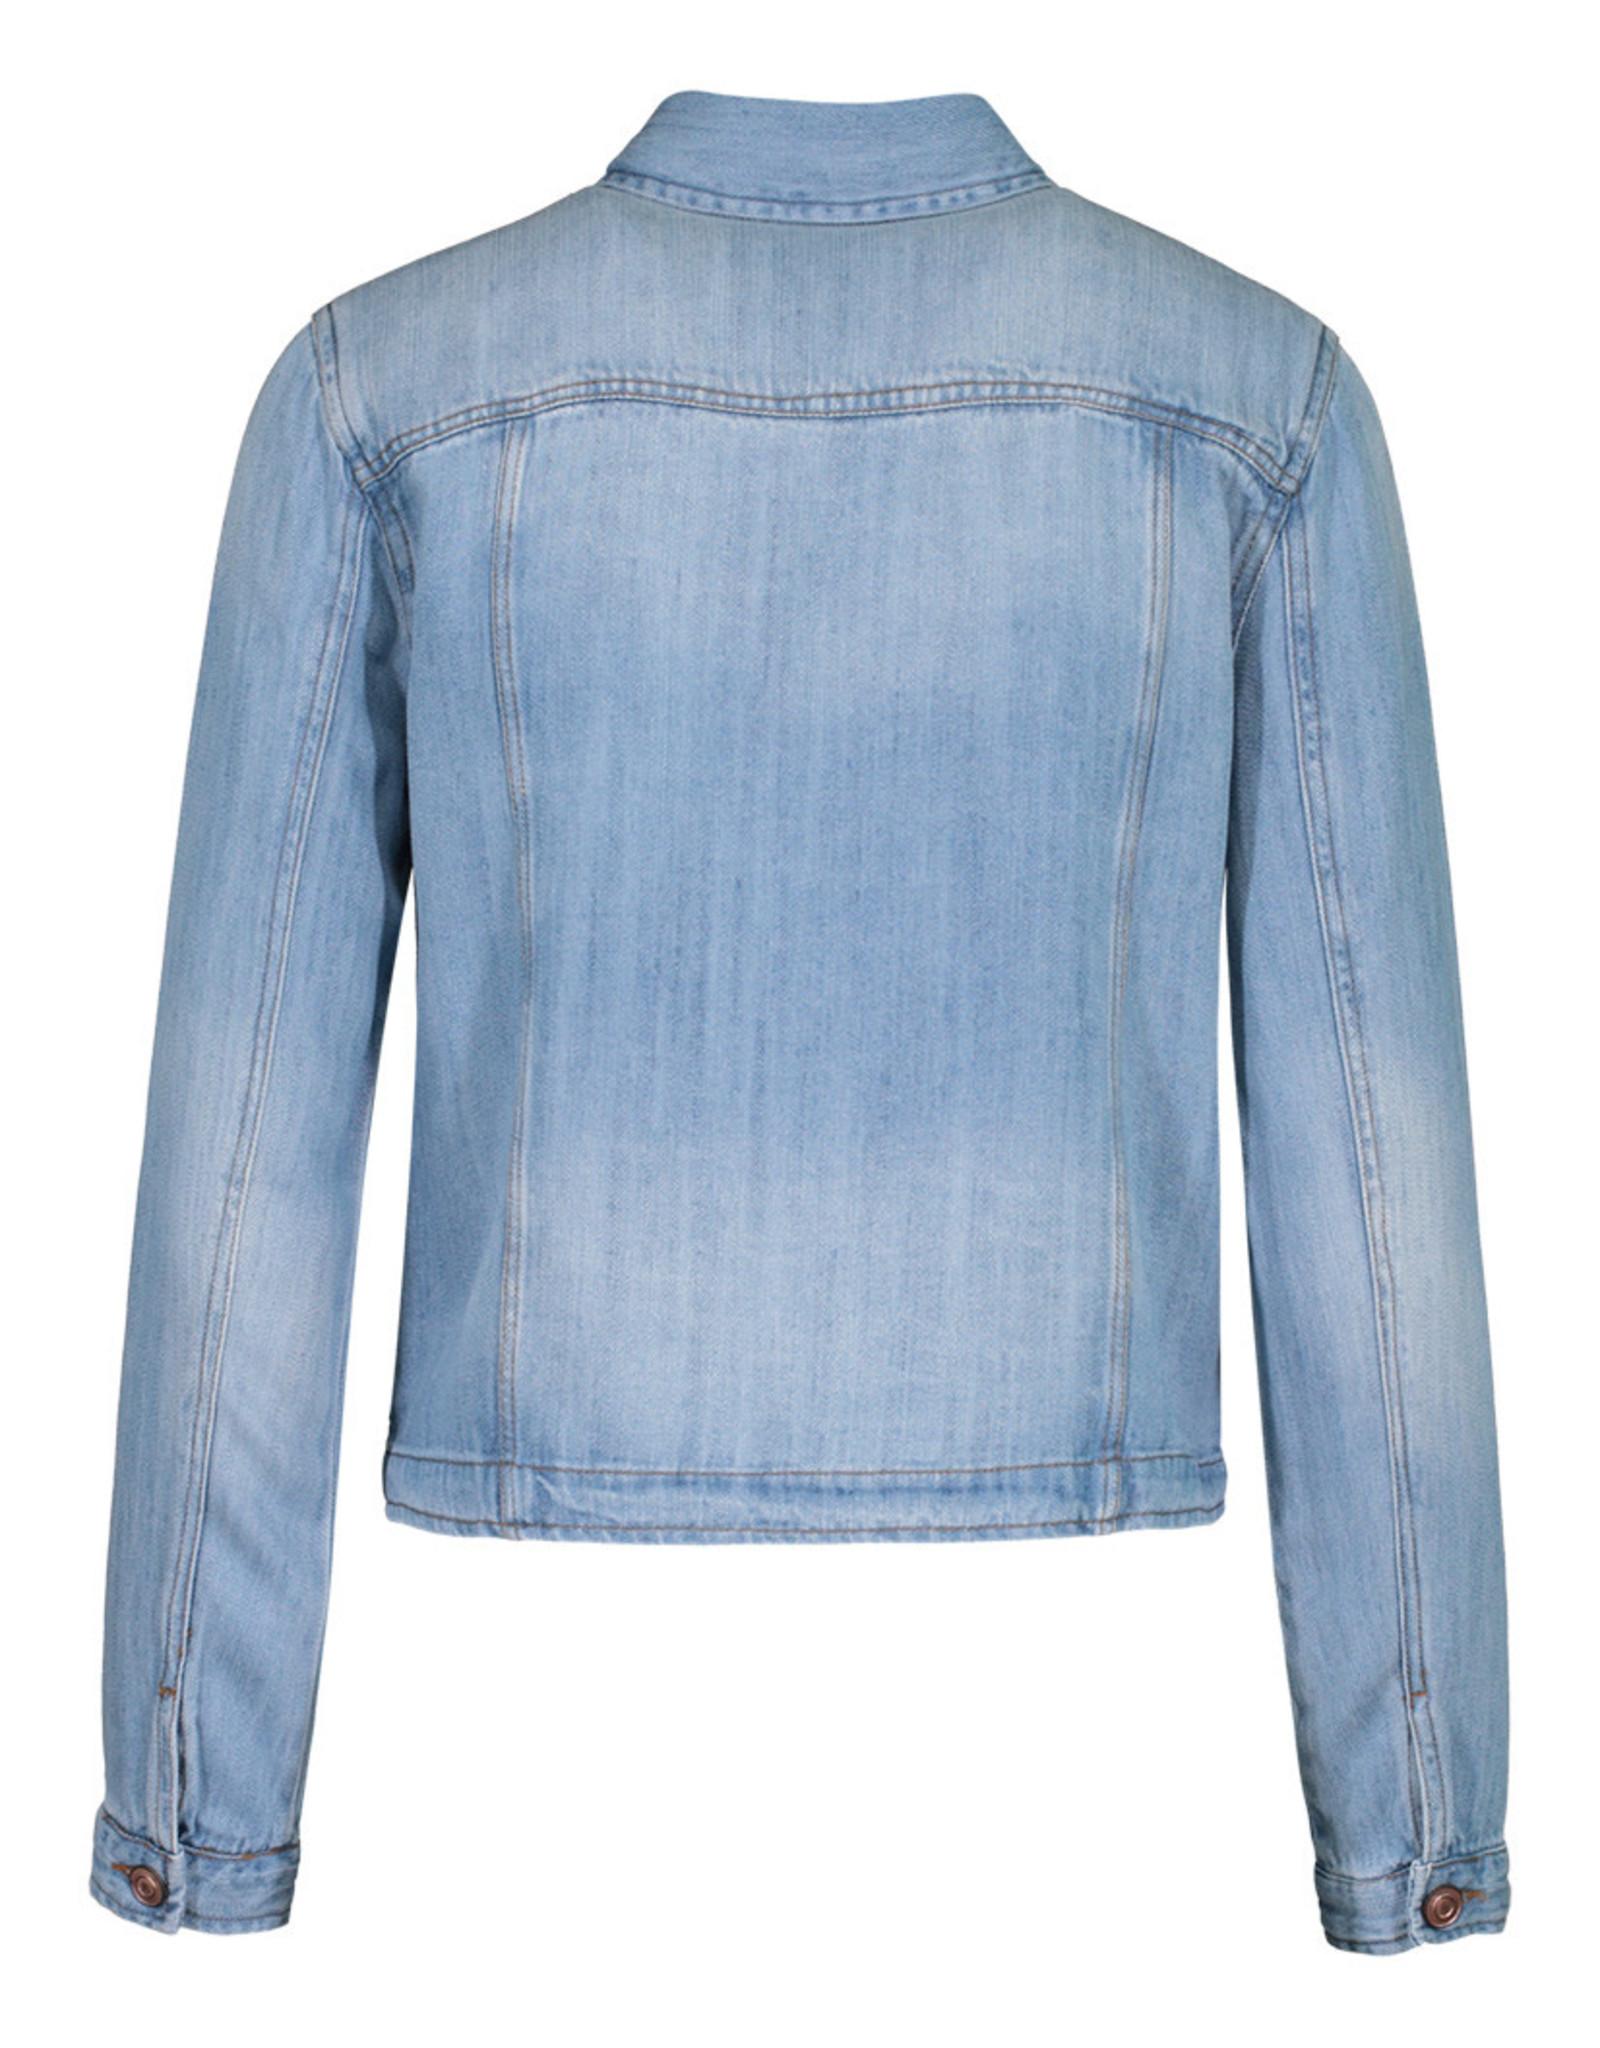 Tribal Light Wash Denim Jacket w/Pockets